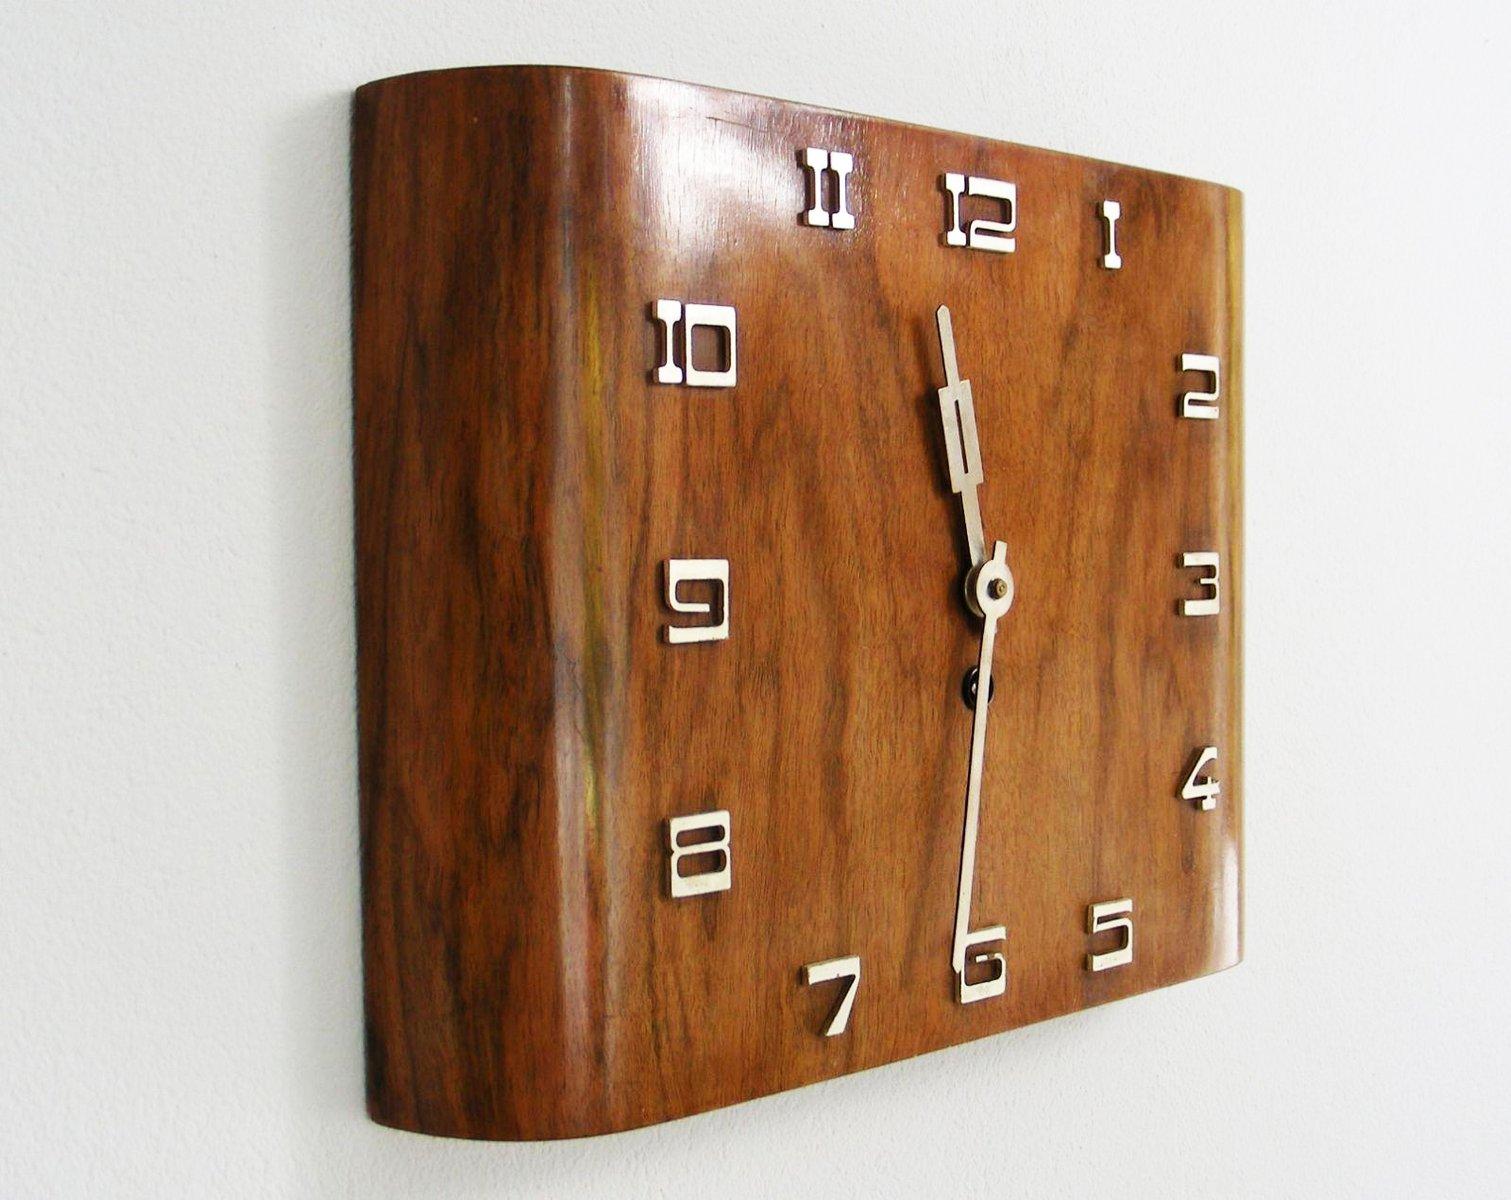 Art Deco Walnut Wall Clock from Kienzle for sale at Pamono